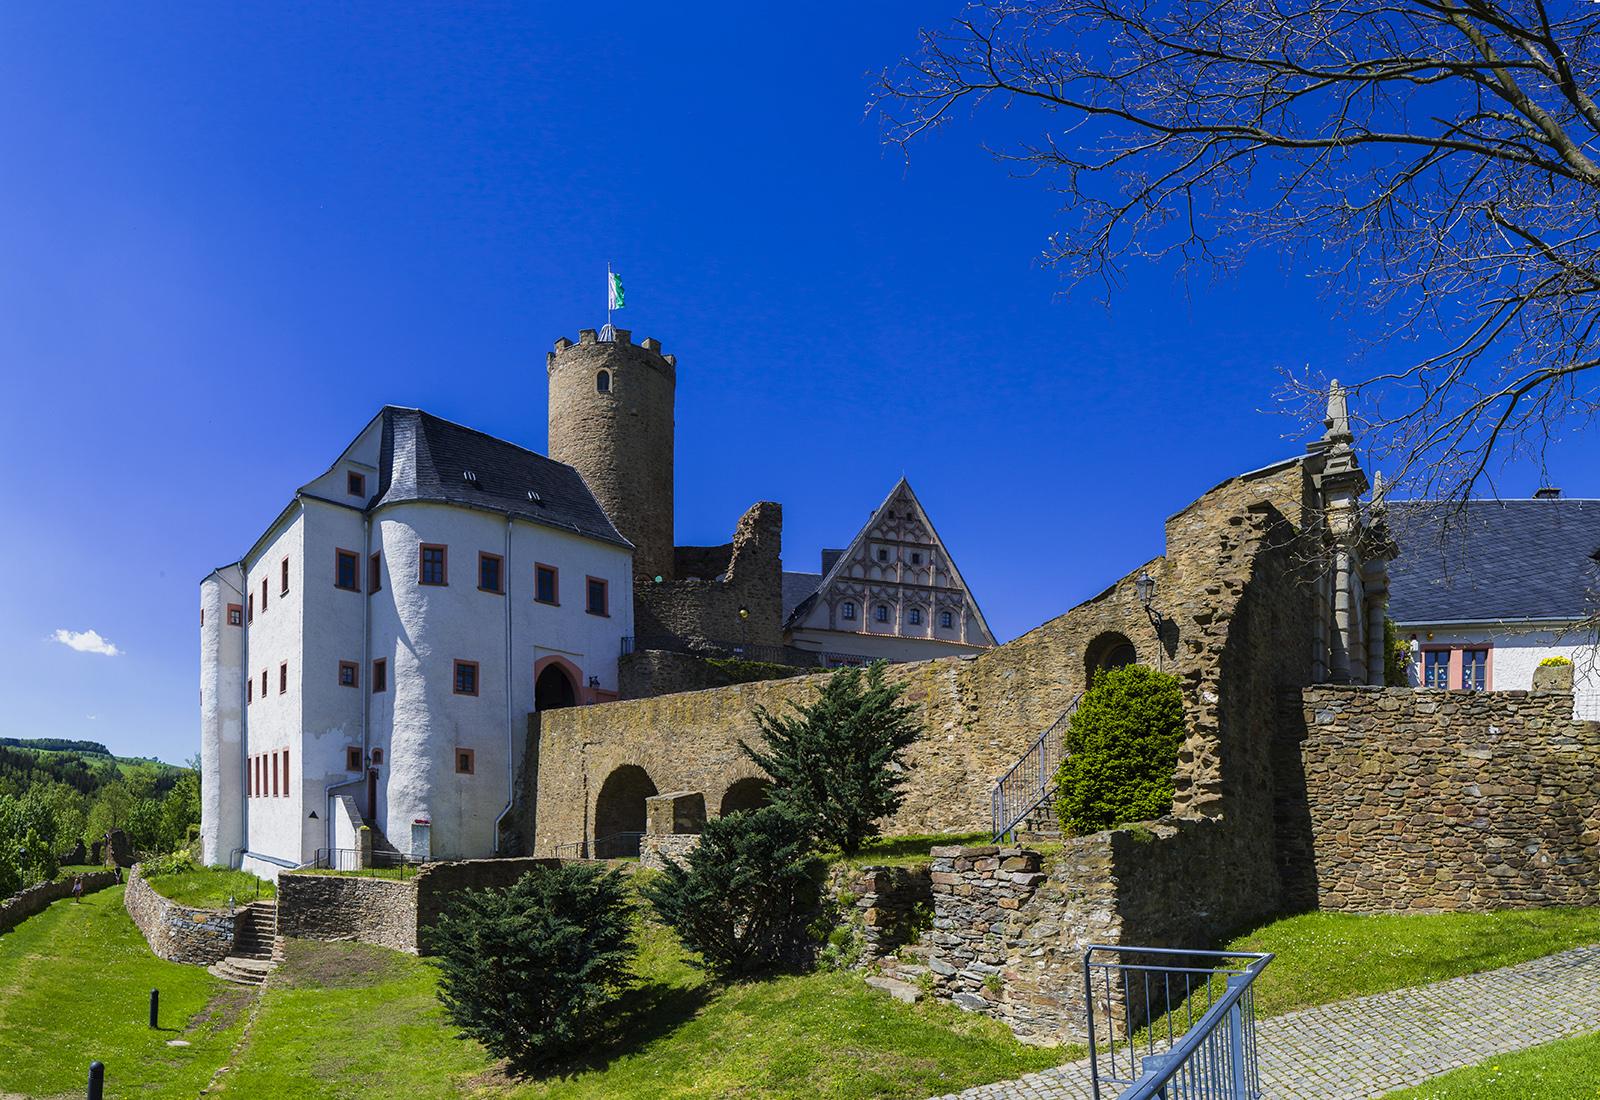 (c) A./S./L. Schlossbetriebe gGmbH/Herr Dittrich